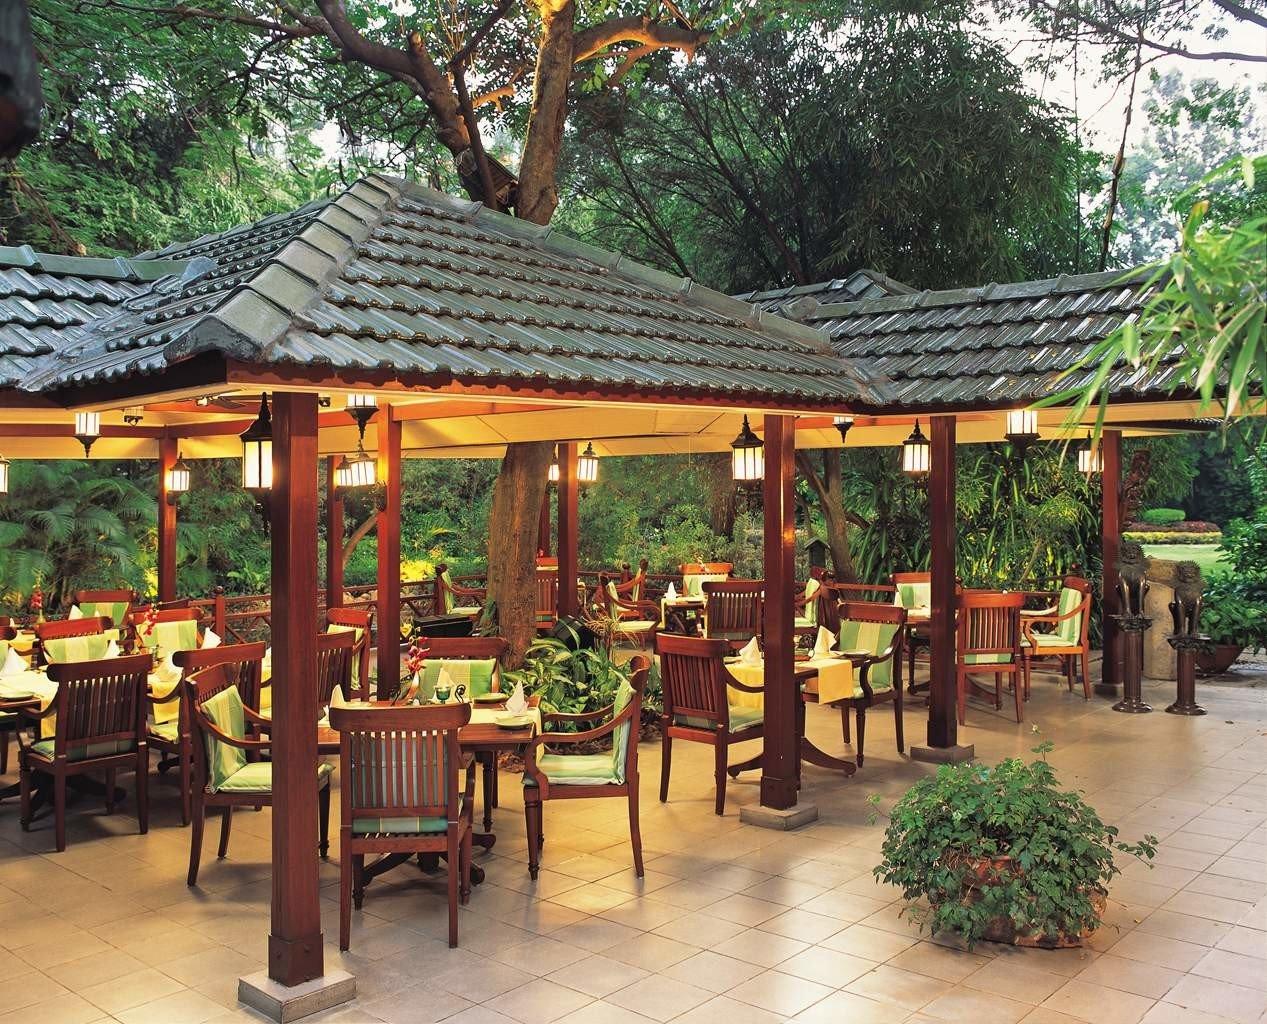 Business City Cultural Dining Elegant Luxury Shop tree ground chair building gazebo Resort outdoor structure eco hotel restaurant shinto shrine set